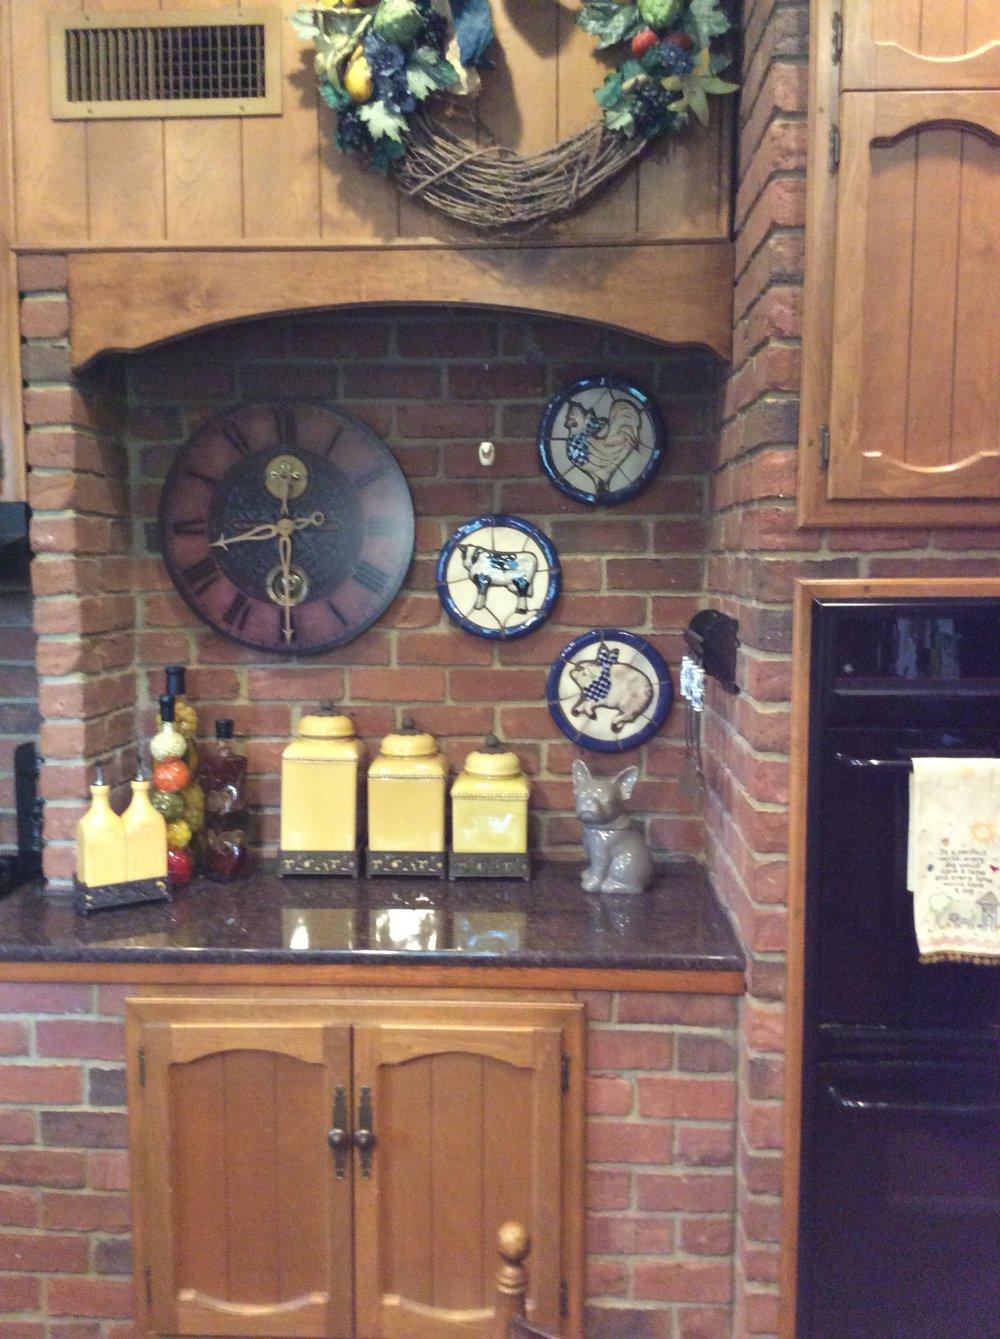 Kitchen Range - Before